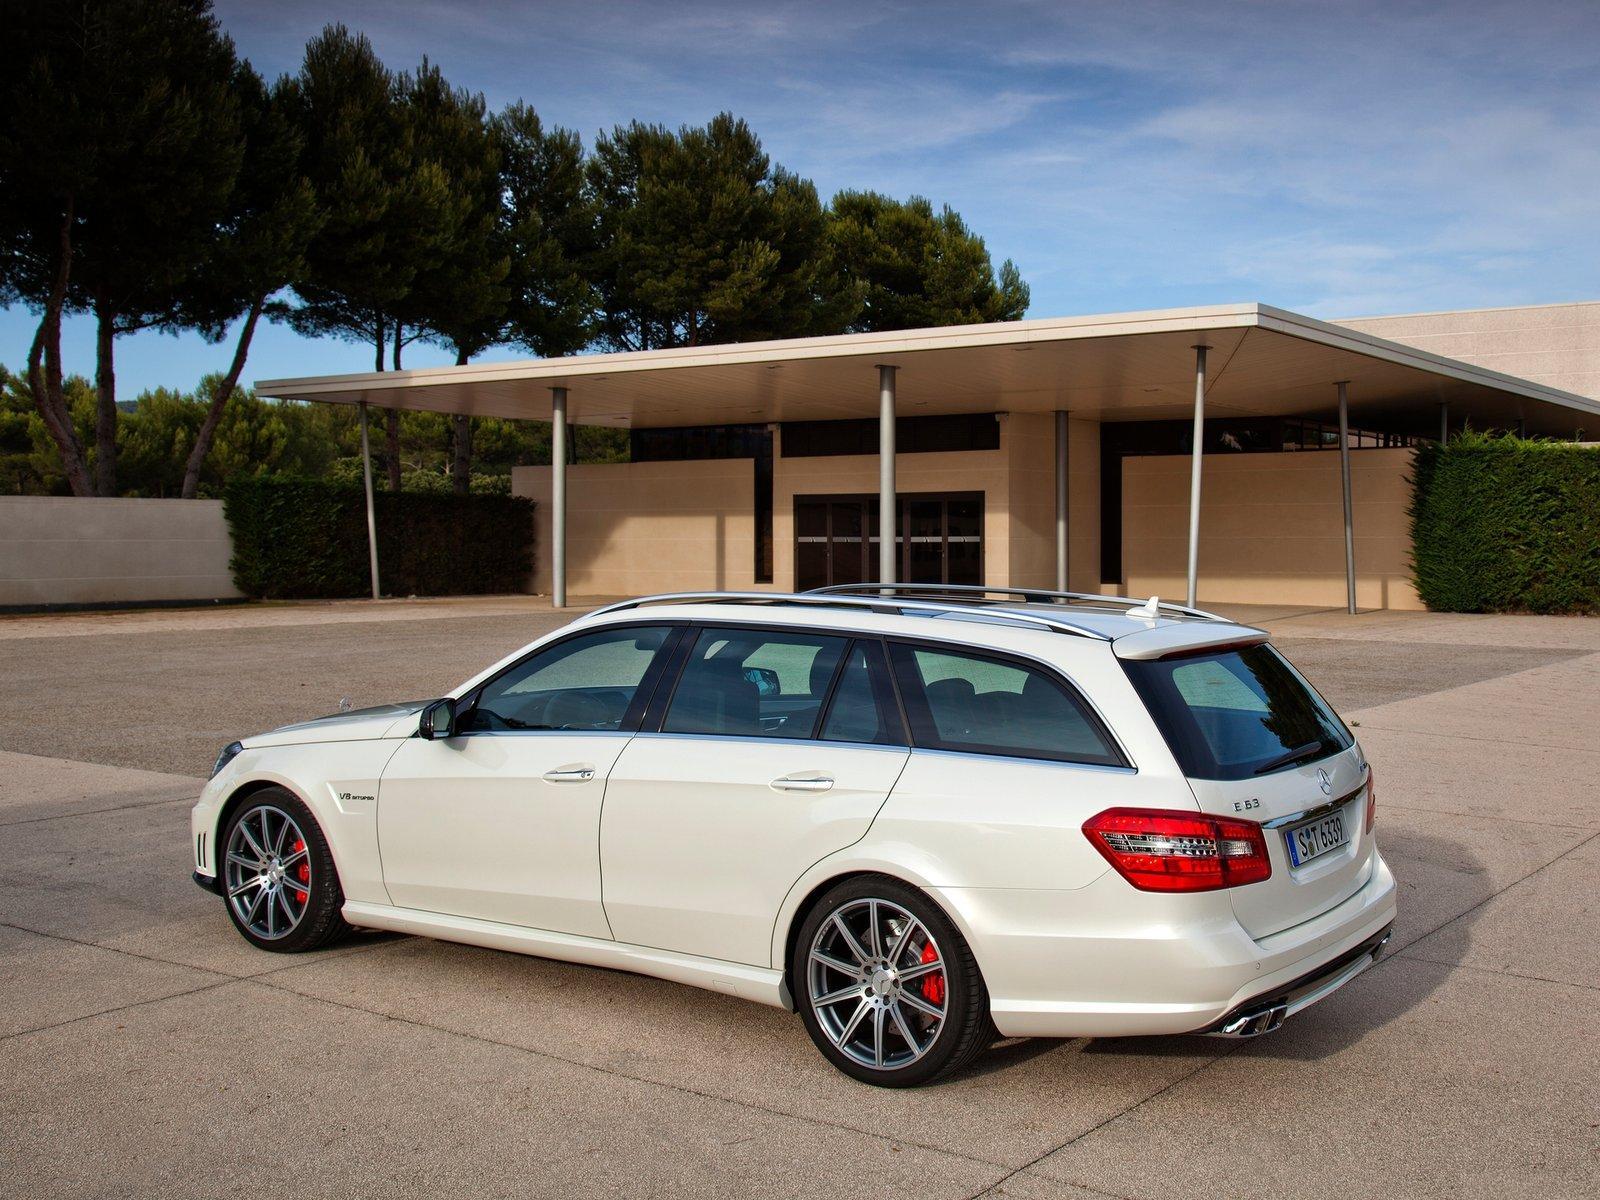 http://1.bp.blogspot.com/-YjyWX8E1BgY/T_fcScc3NqI/AAAAAAAAEPc/wTBMyS-0iQQ/s1600/Mercedes-Benz+E63+AMG+Wagon+Hd+Wallpapers+2012_4.jpg